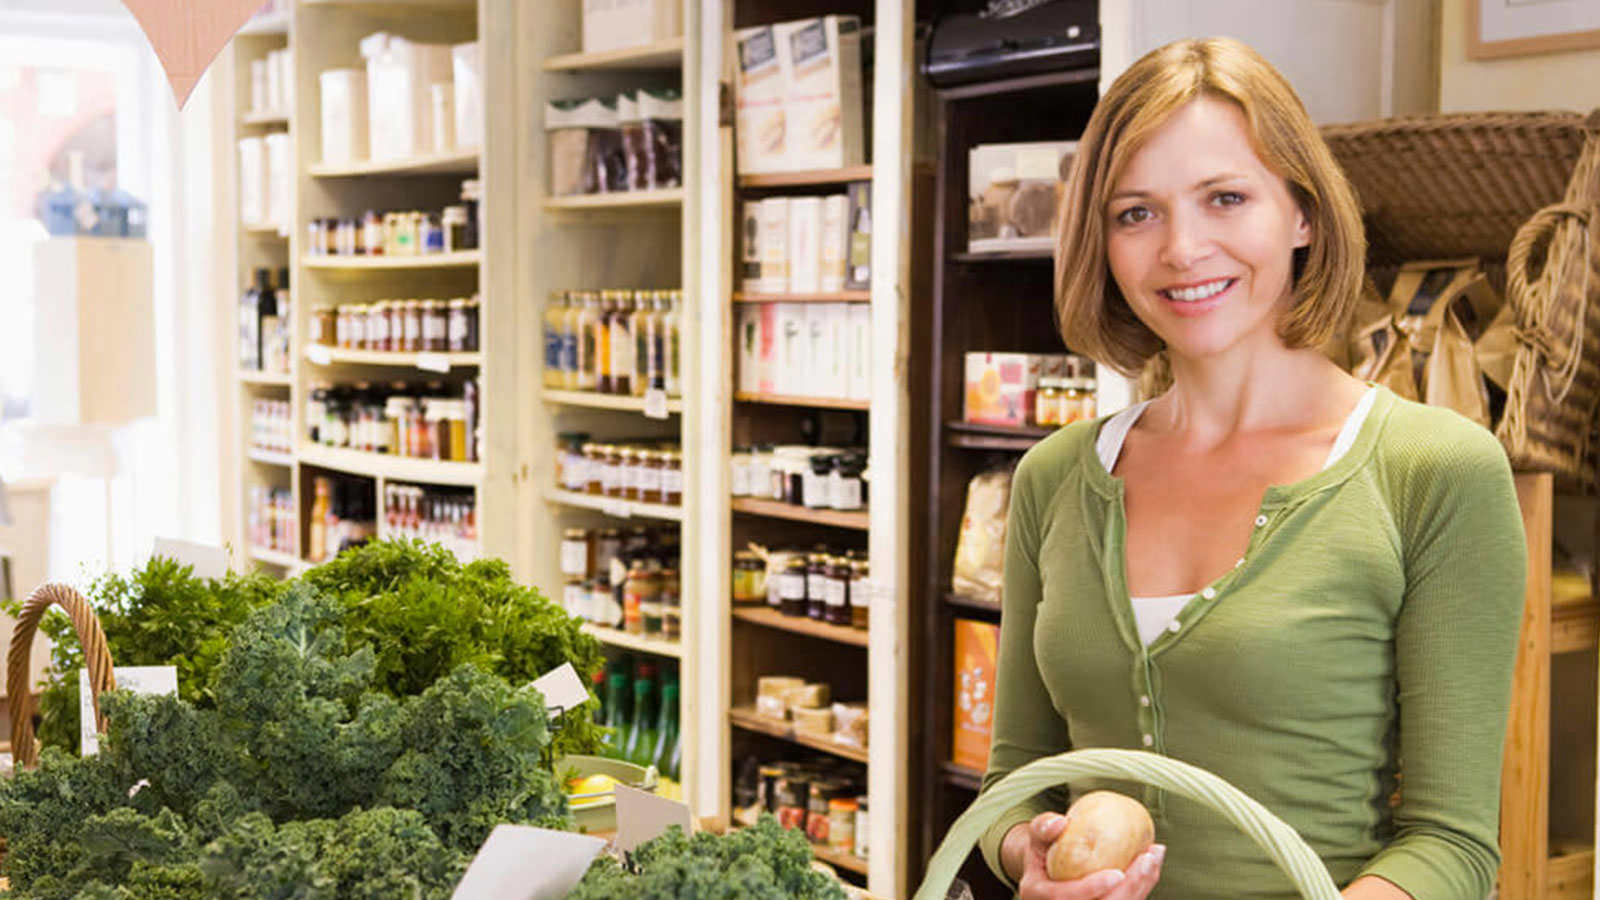 Customer Retention and the Bottom Line